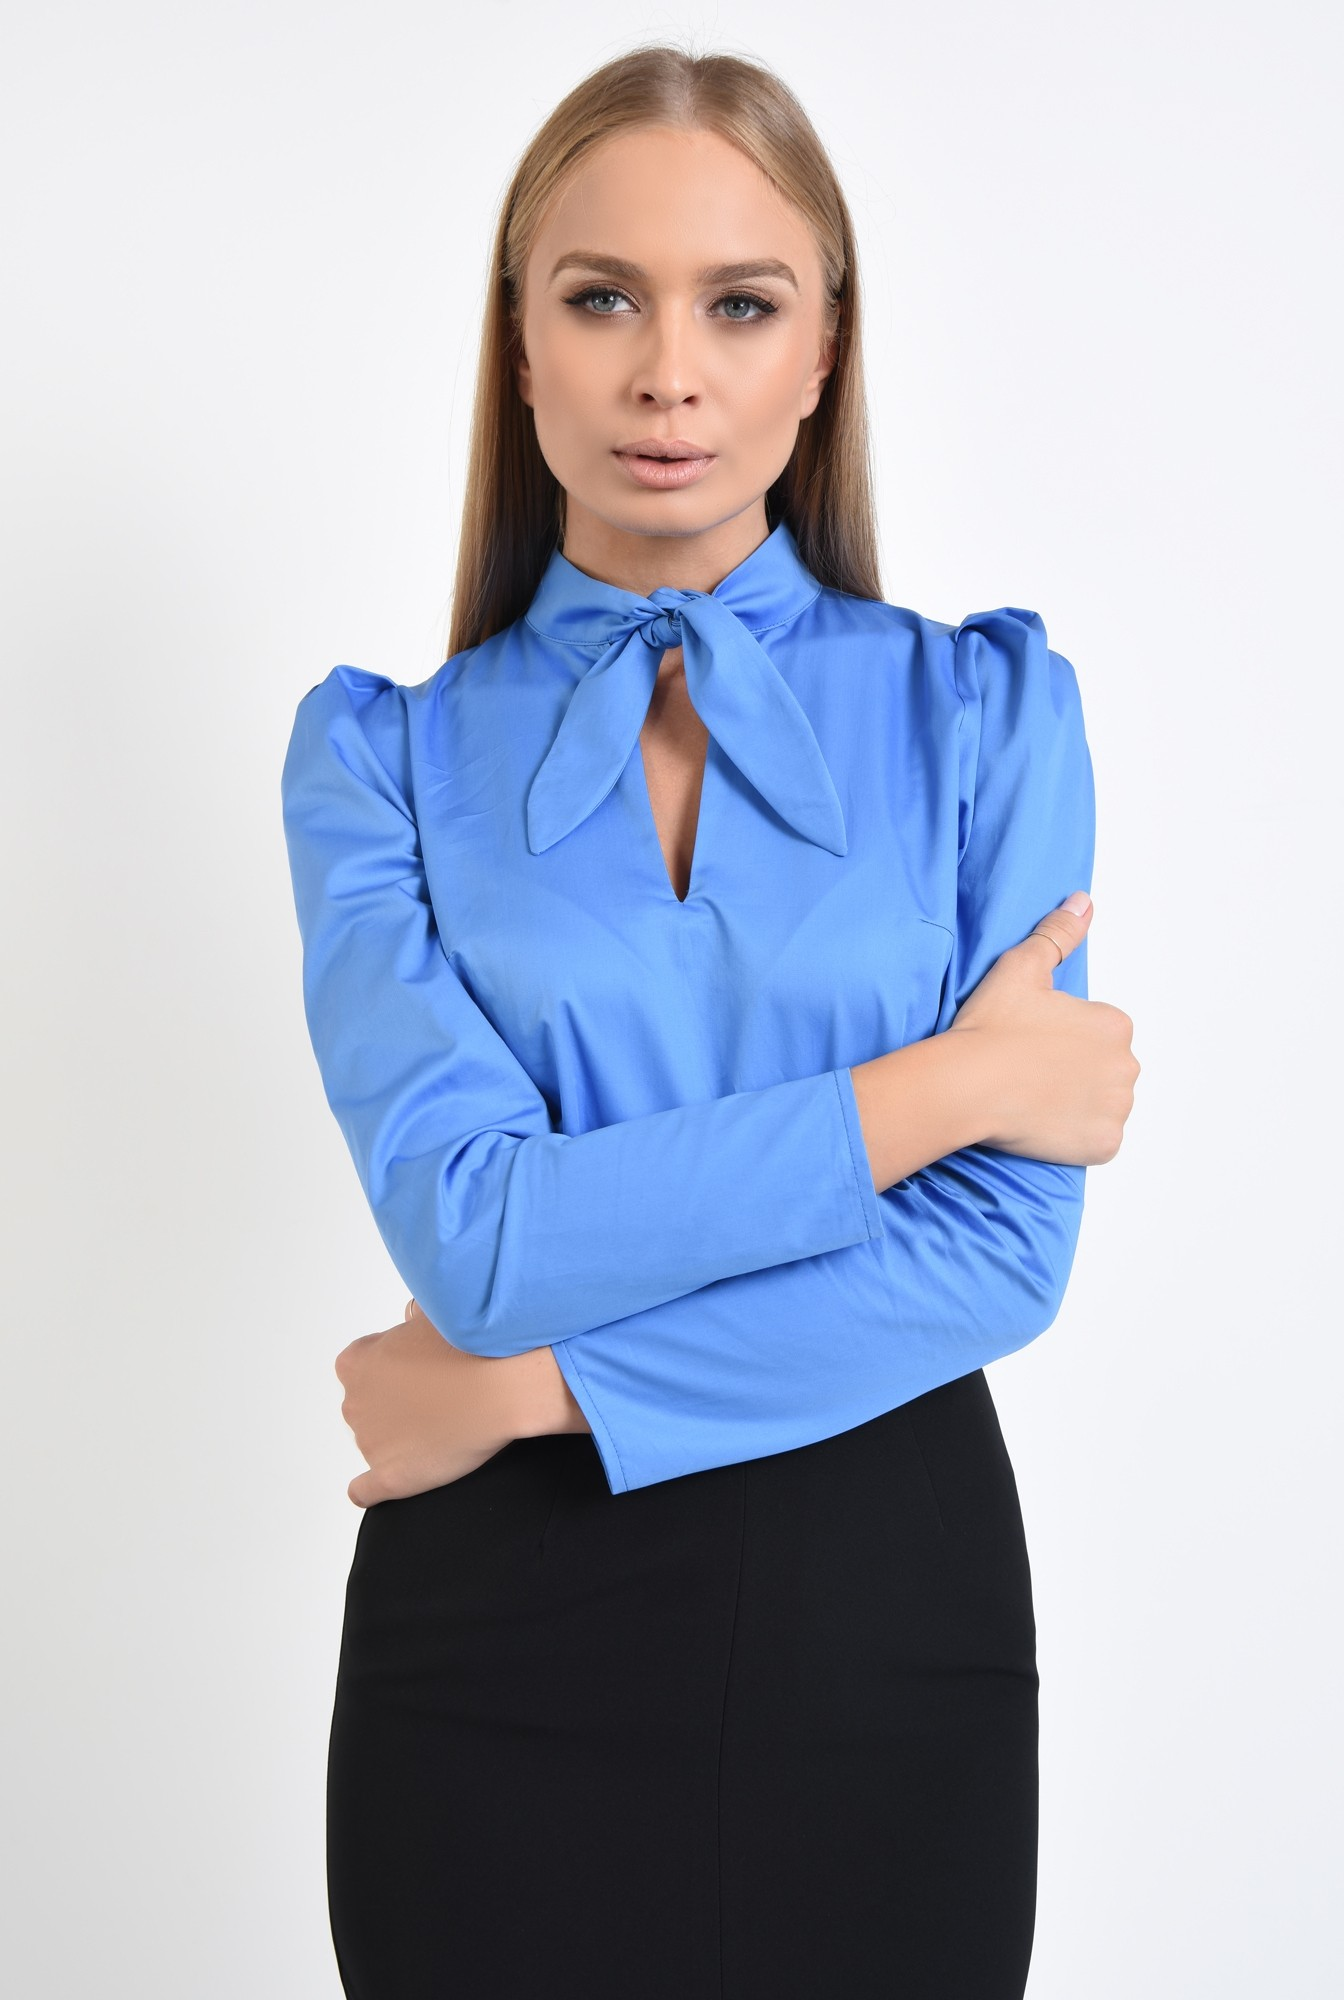 0 - 360 - bluza din bumbac, albastra, maneci lungi